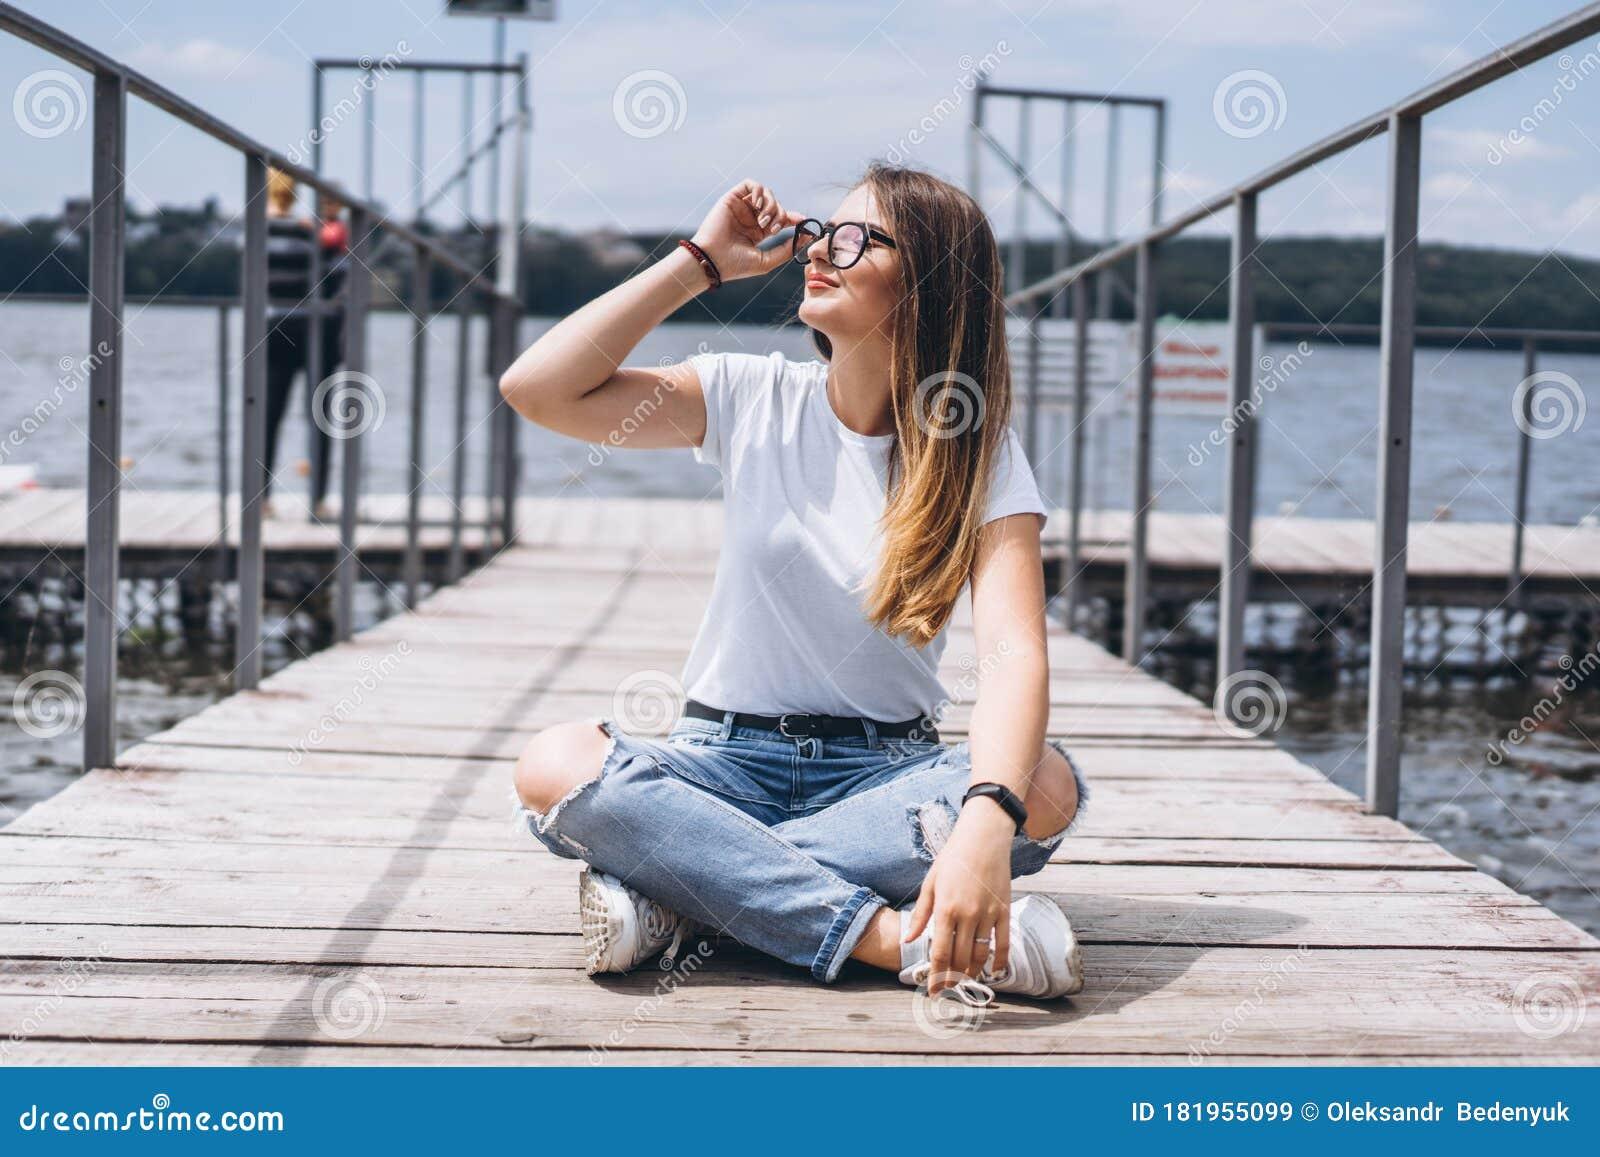 Caucasian Model Posing In Wet White Shirt In Water. Stock